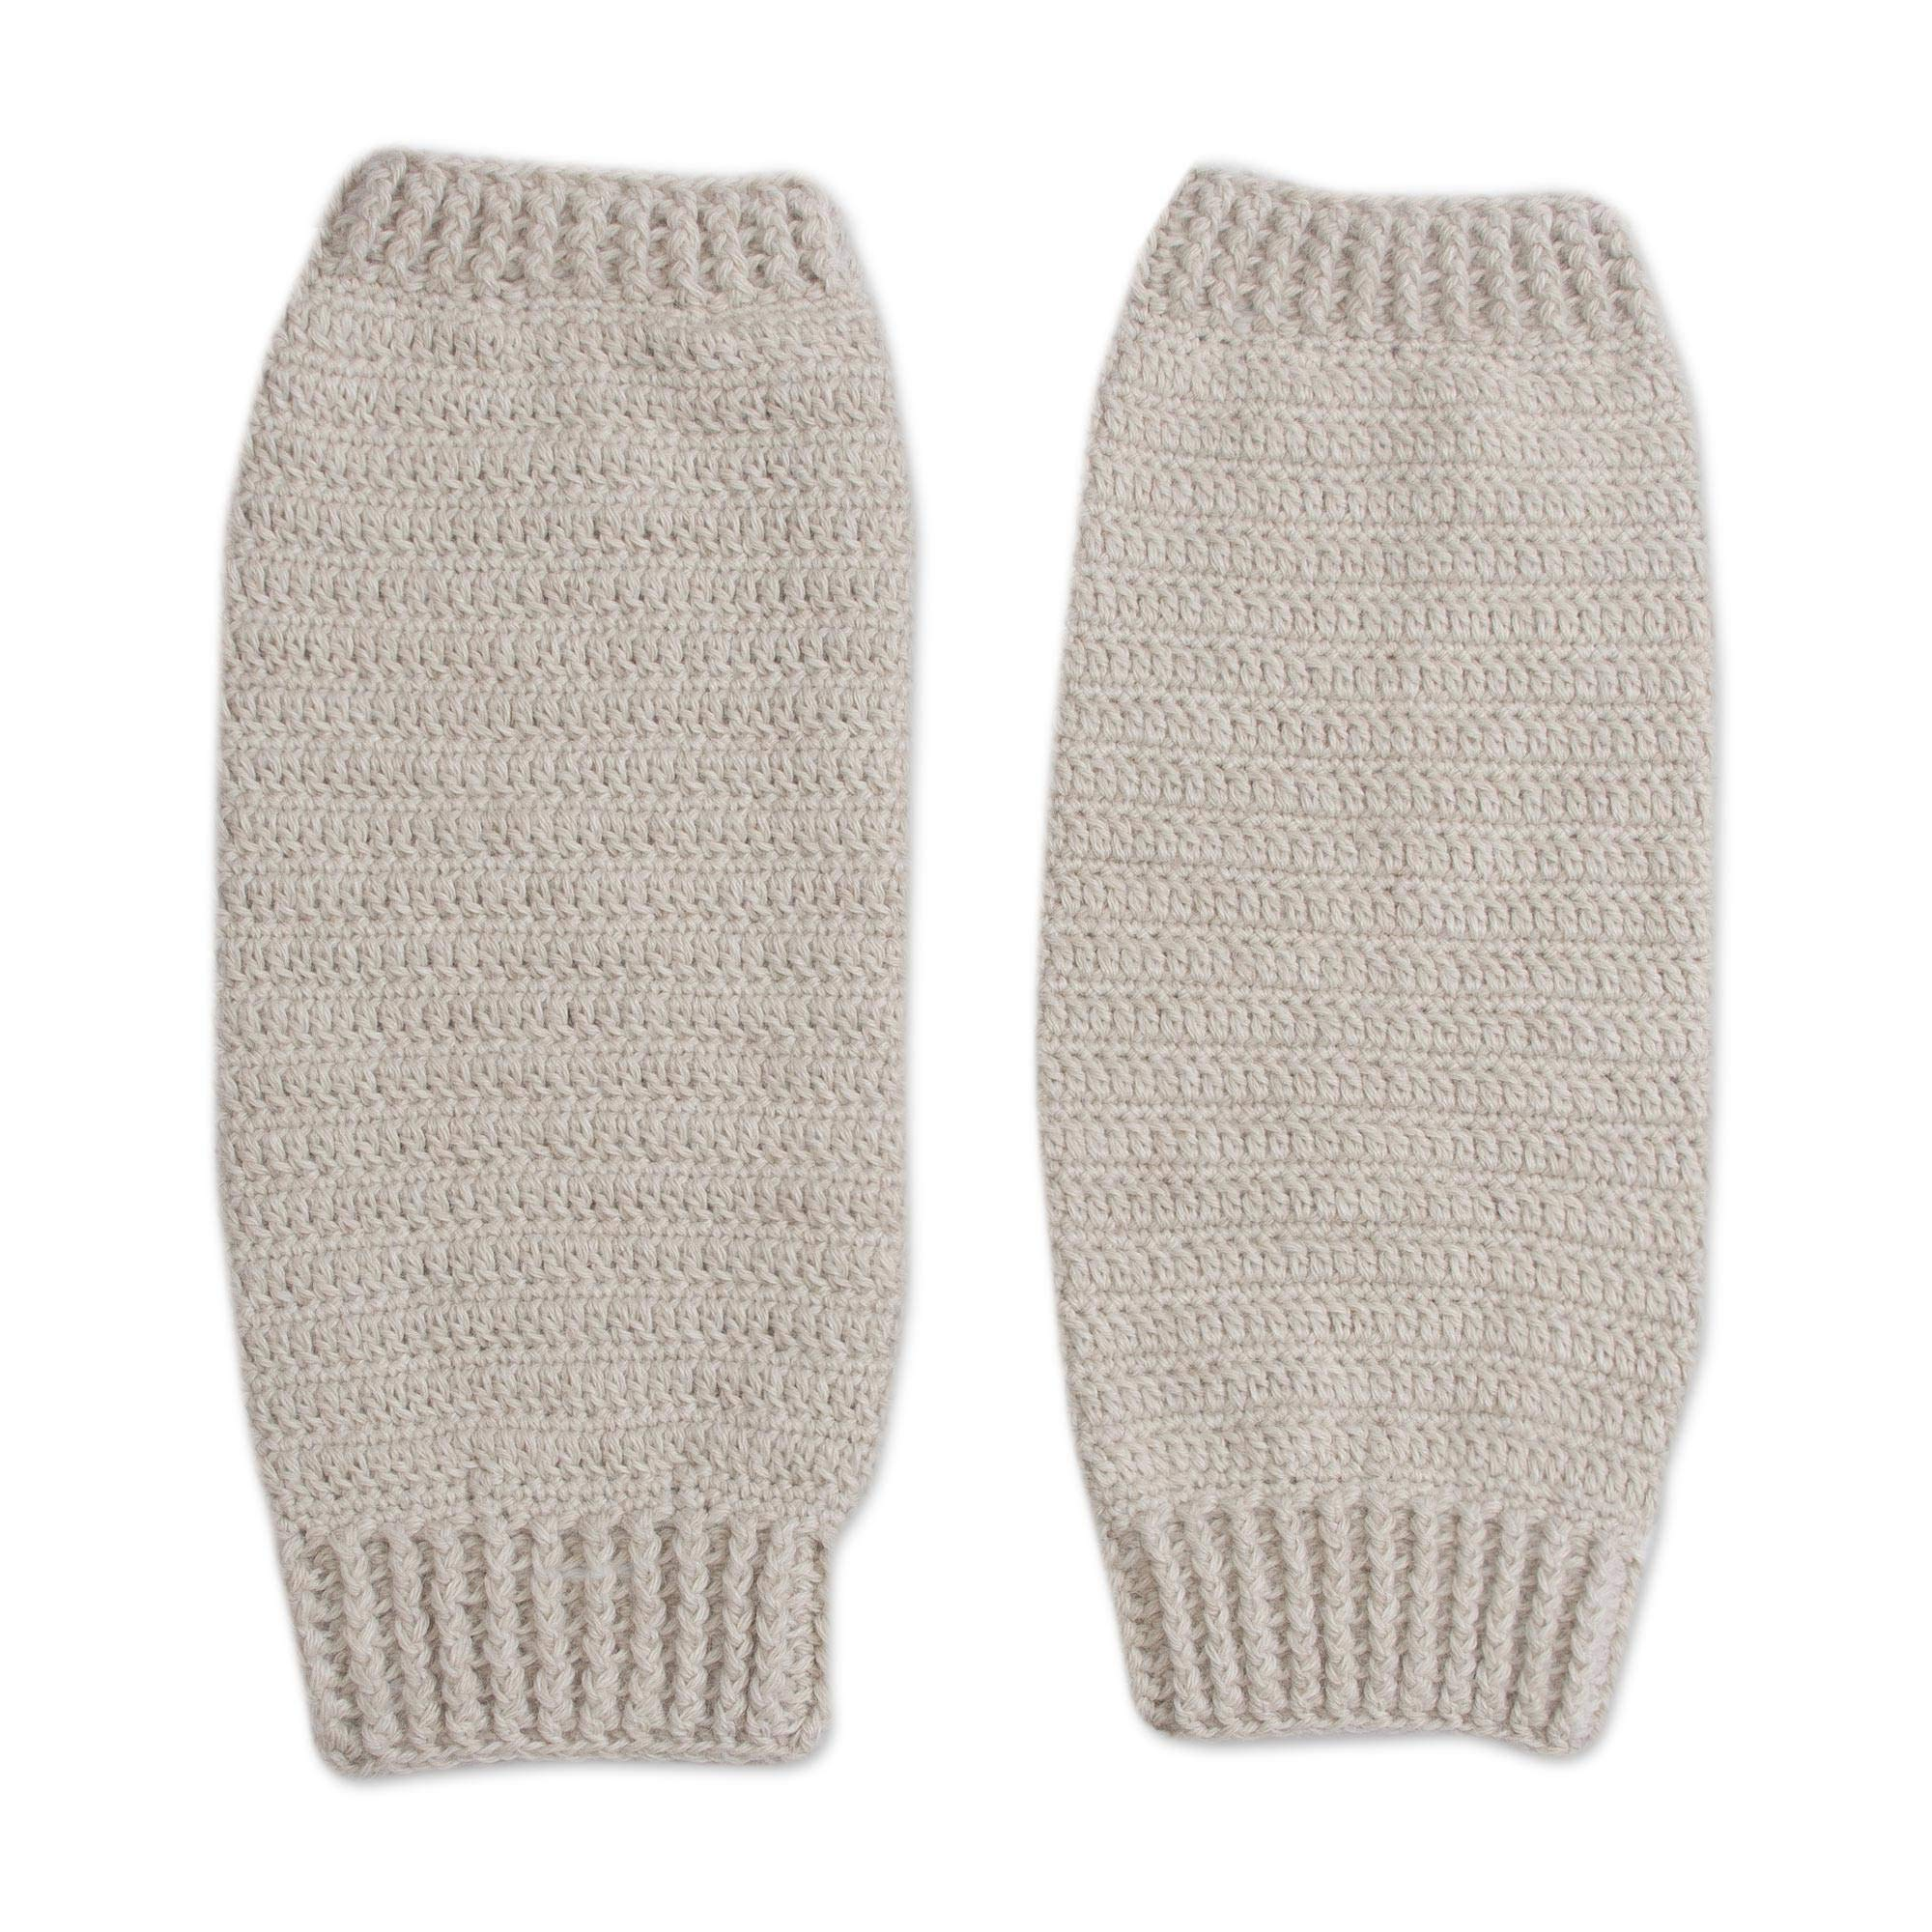 NOVICA Ivory Alpaca Blend Leg Warmers, Cozy Ivory' by NOVICA